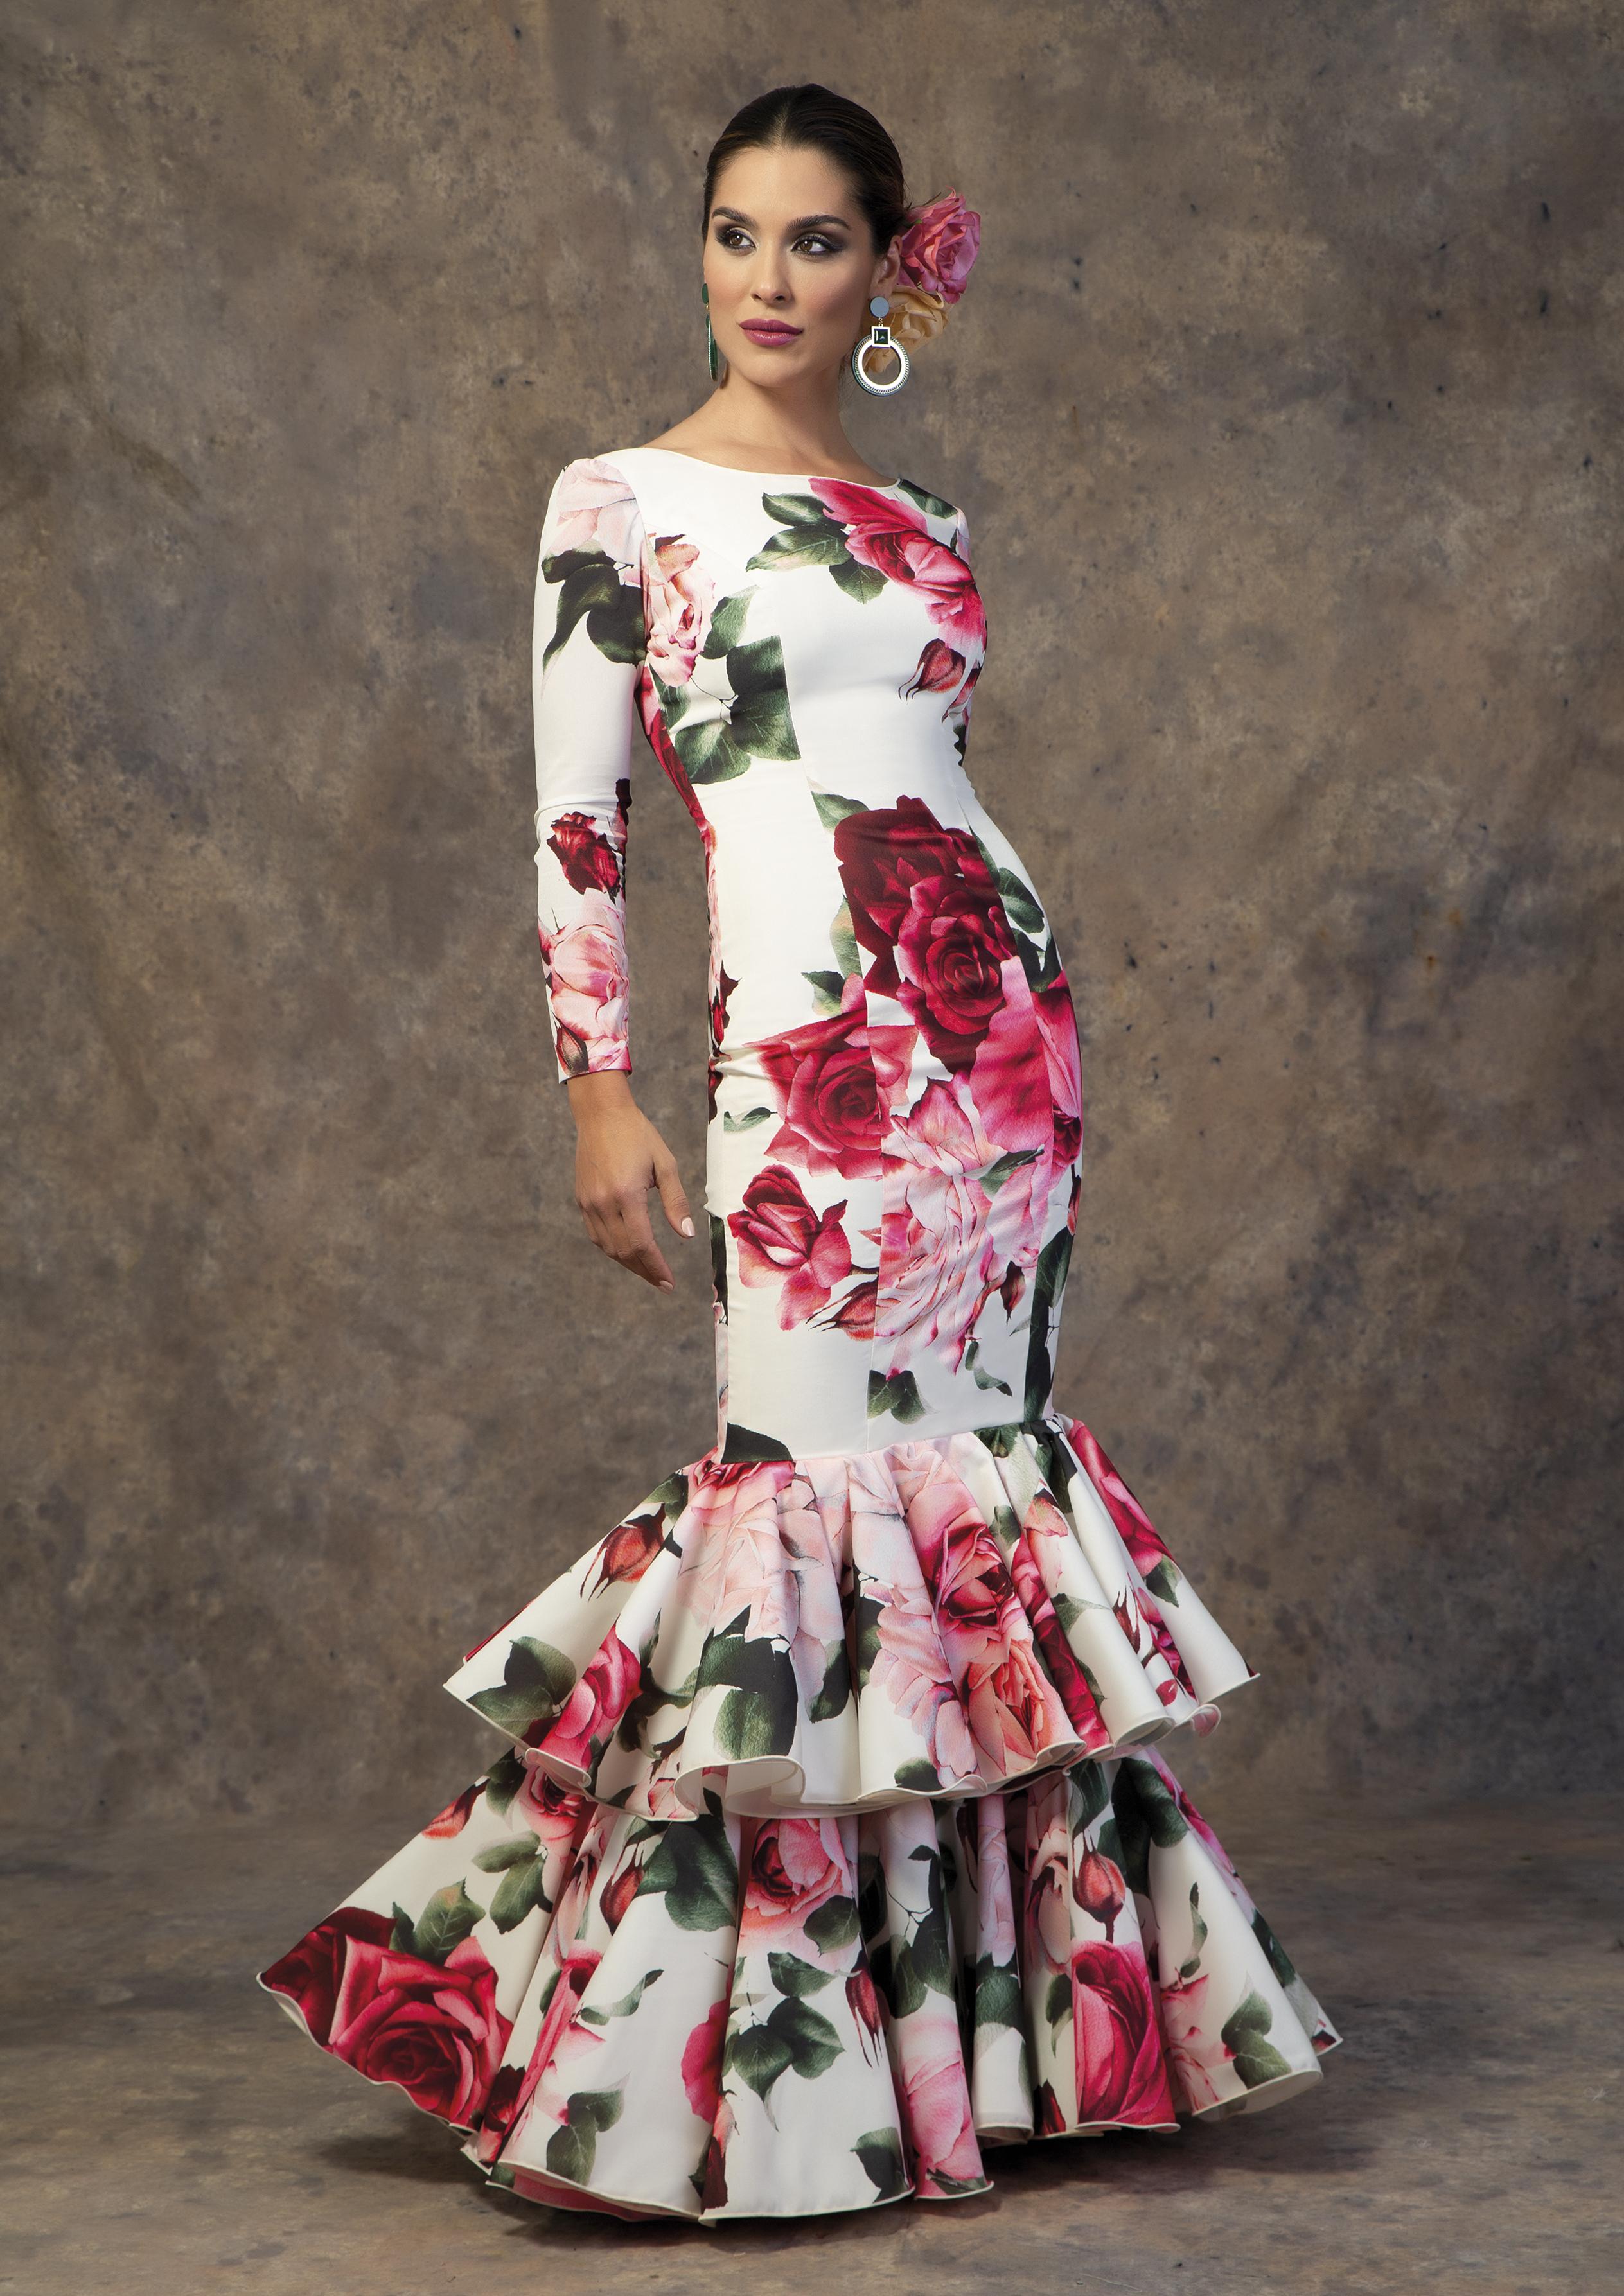 7487486d3fdb7 Traje de flamenca con flores de Aires de Feria 2019. Modelo Capricho.